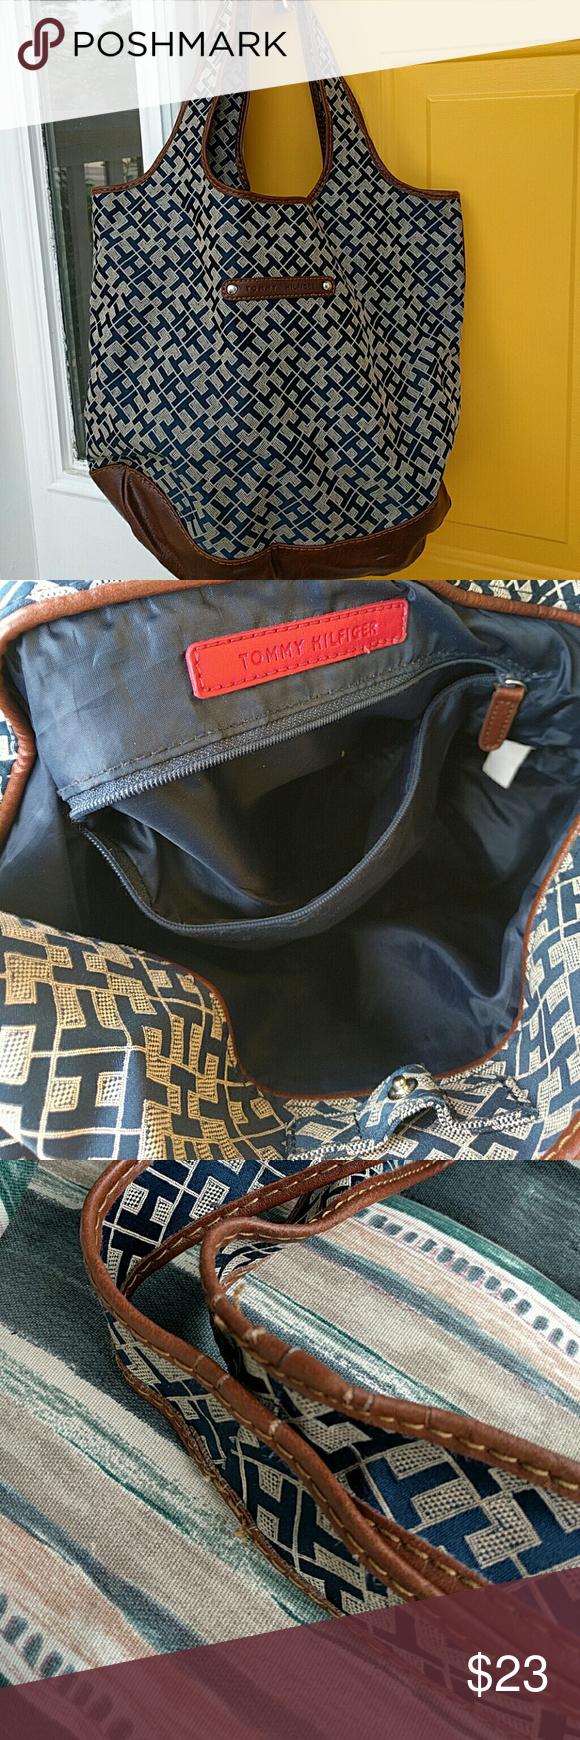 Tommy Hilfiger tote Tommy Hilfiger tote bag.  Canvas/leather. Slight wear on shoulder straps but still GUC Tommy Hilfiger Bags Totes